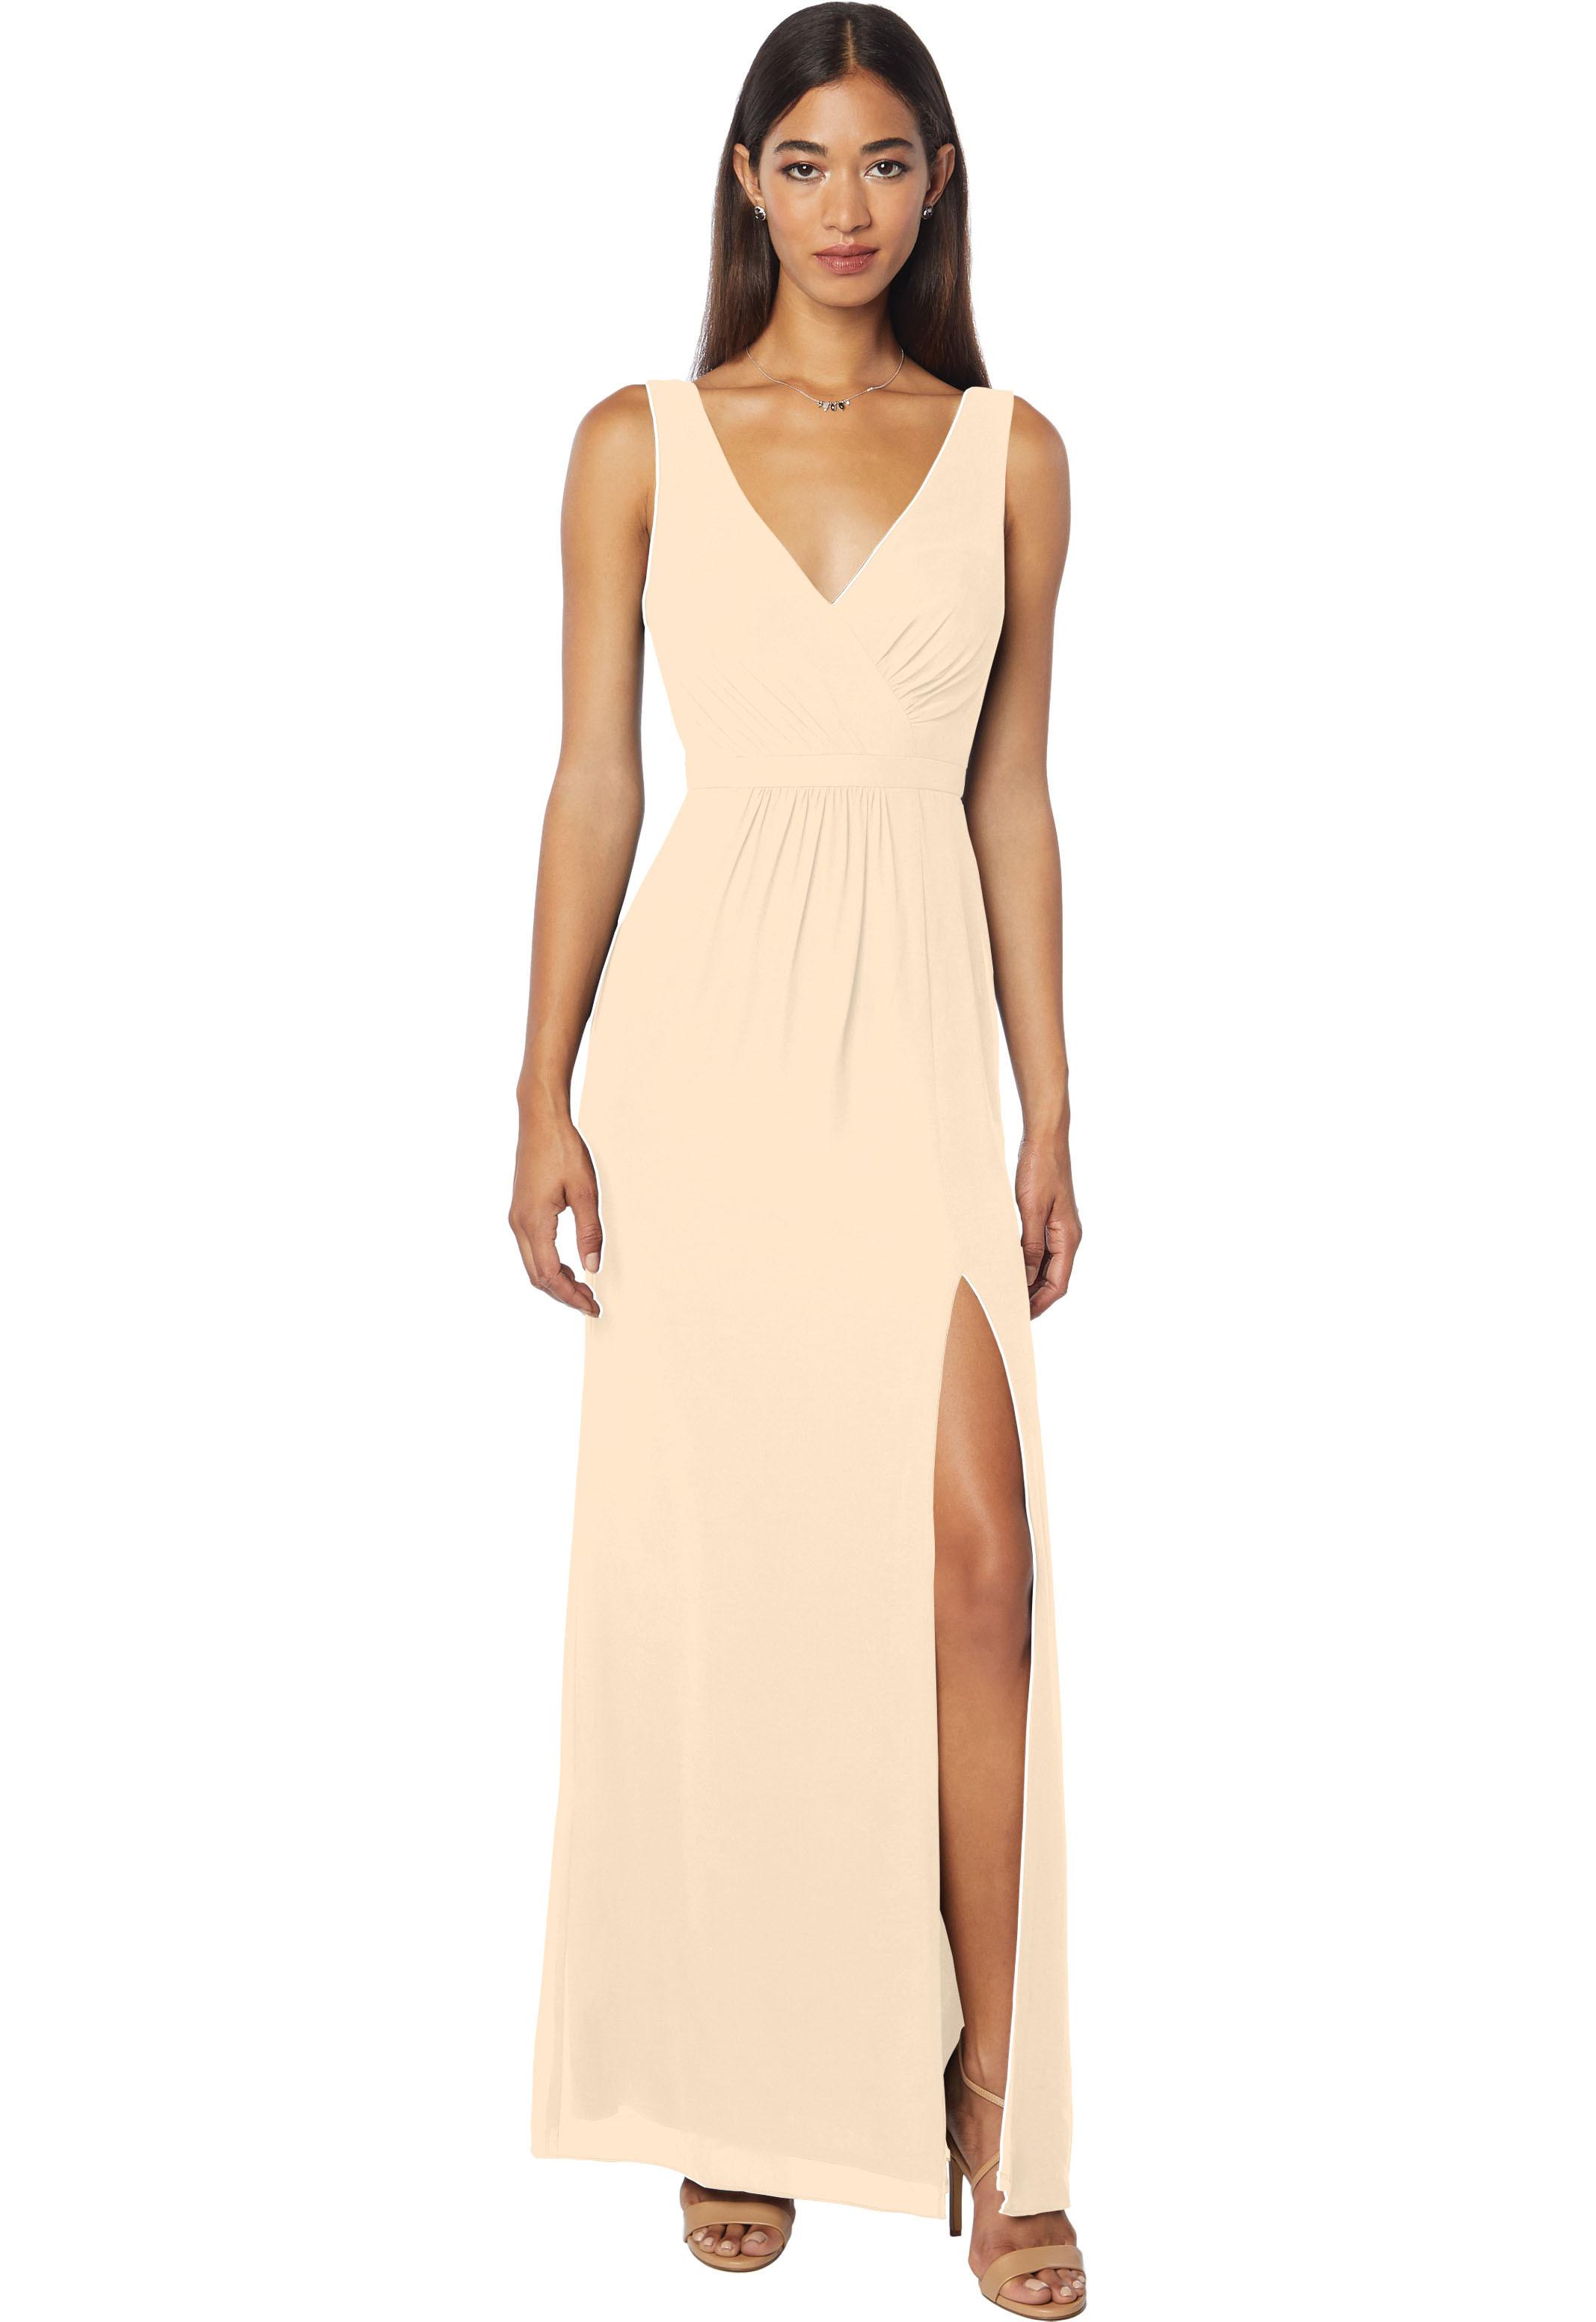 Bill Levkoff CHAMPAGNE Chiffon Sleeveless Natural Waist gown, $178.00 Front